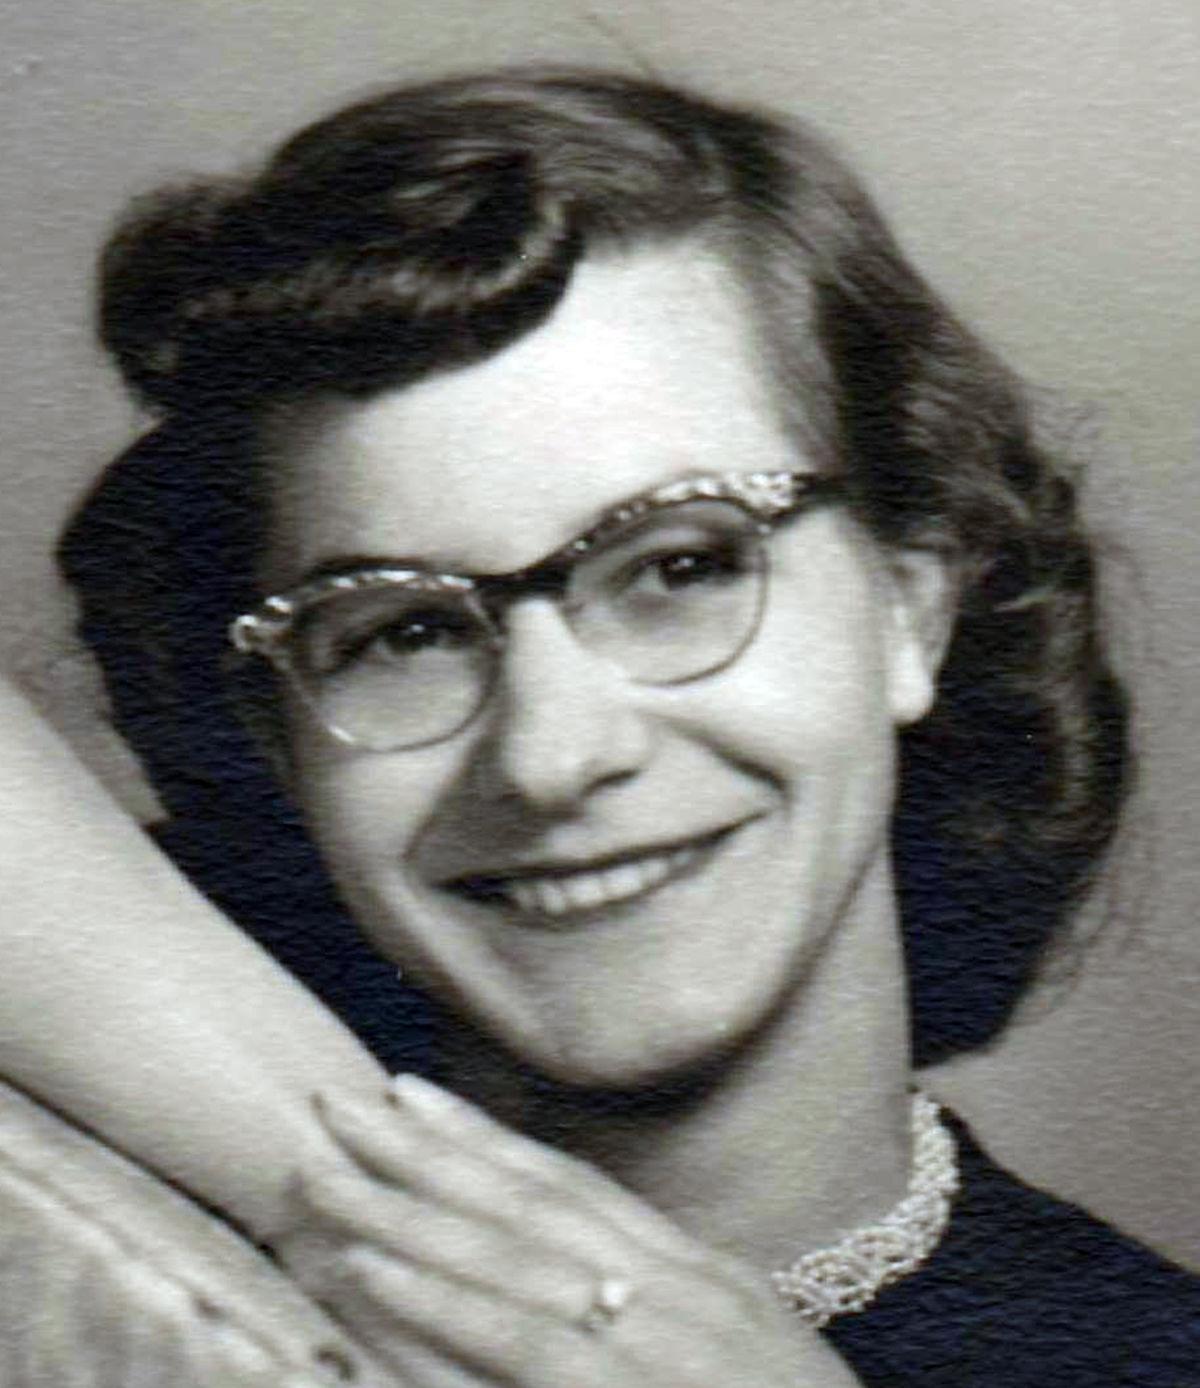 Della Bernecki